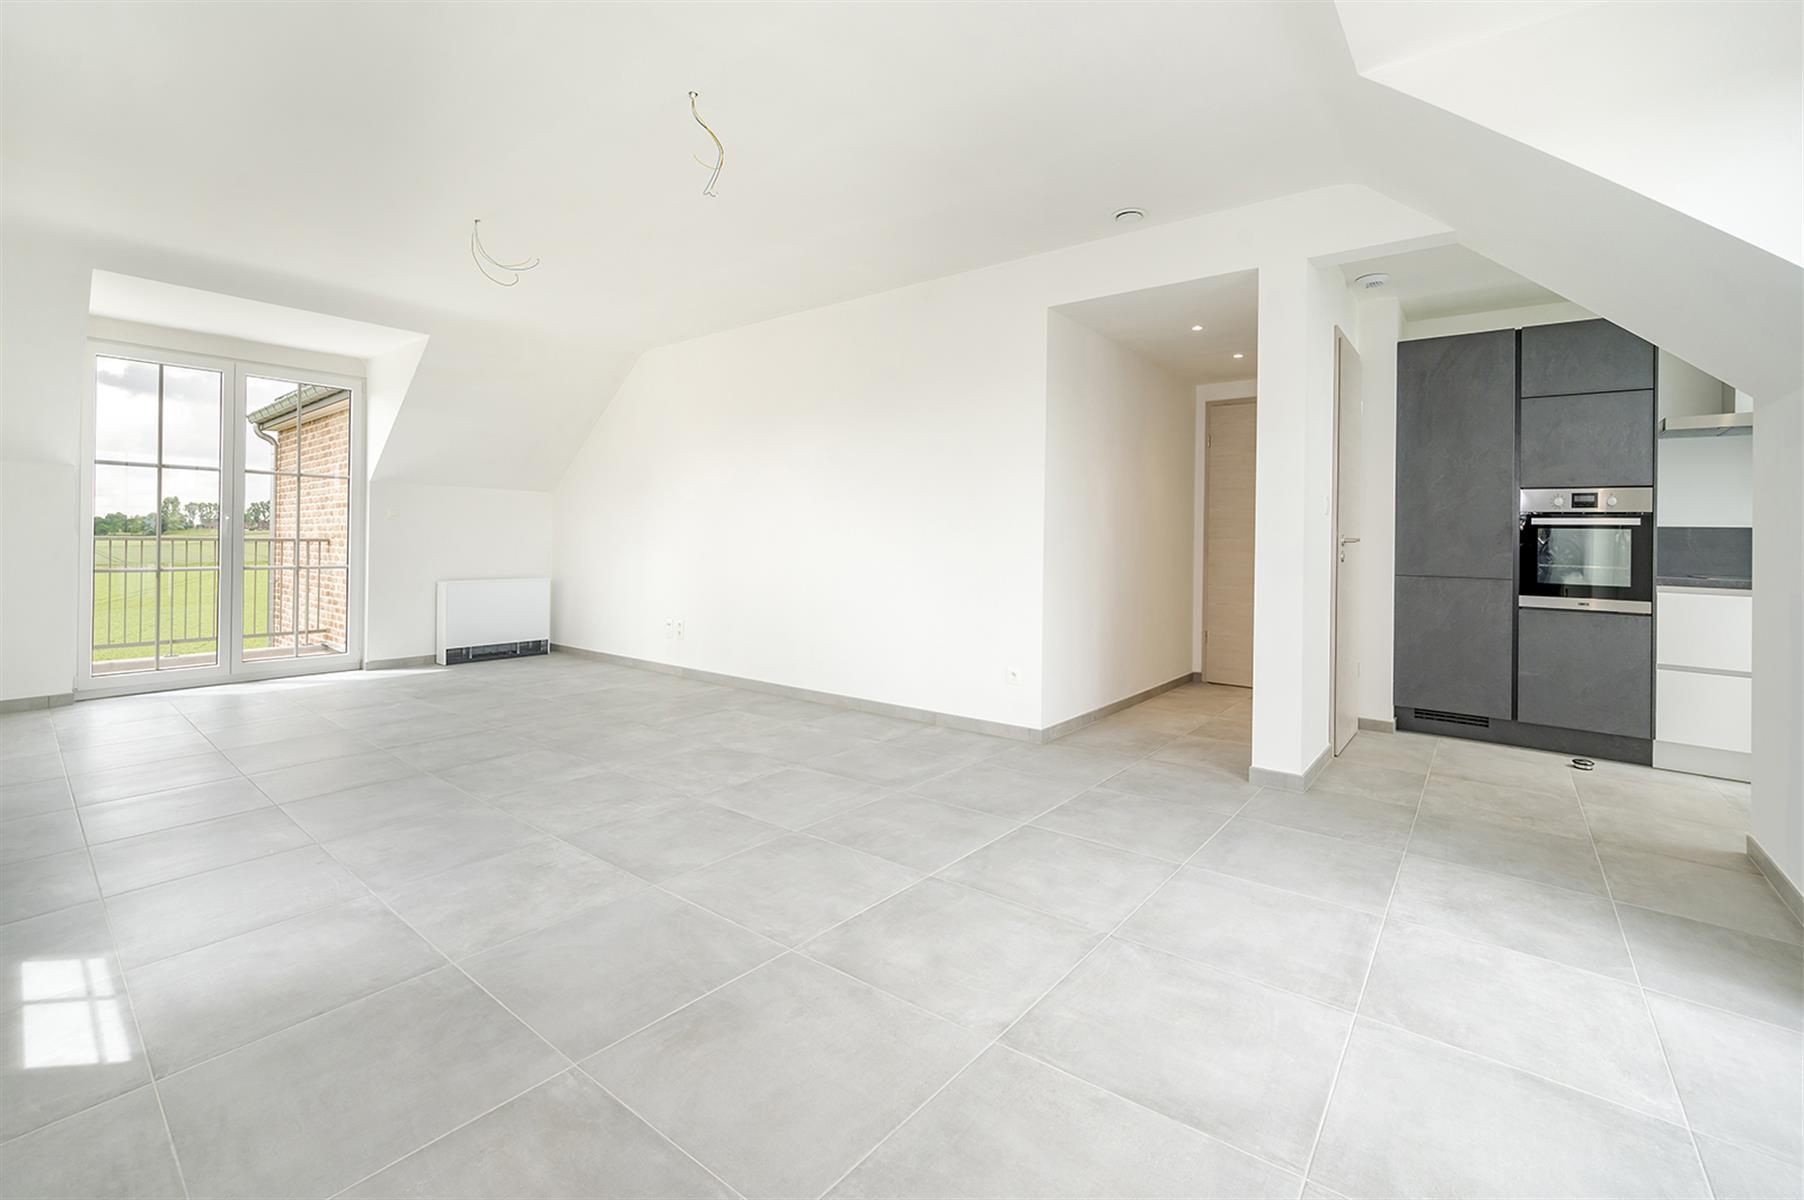 Appartement avec jardin - Huy - #3807148-6